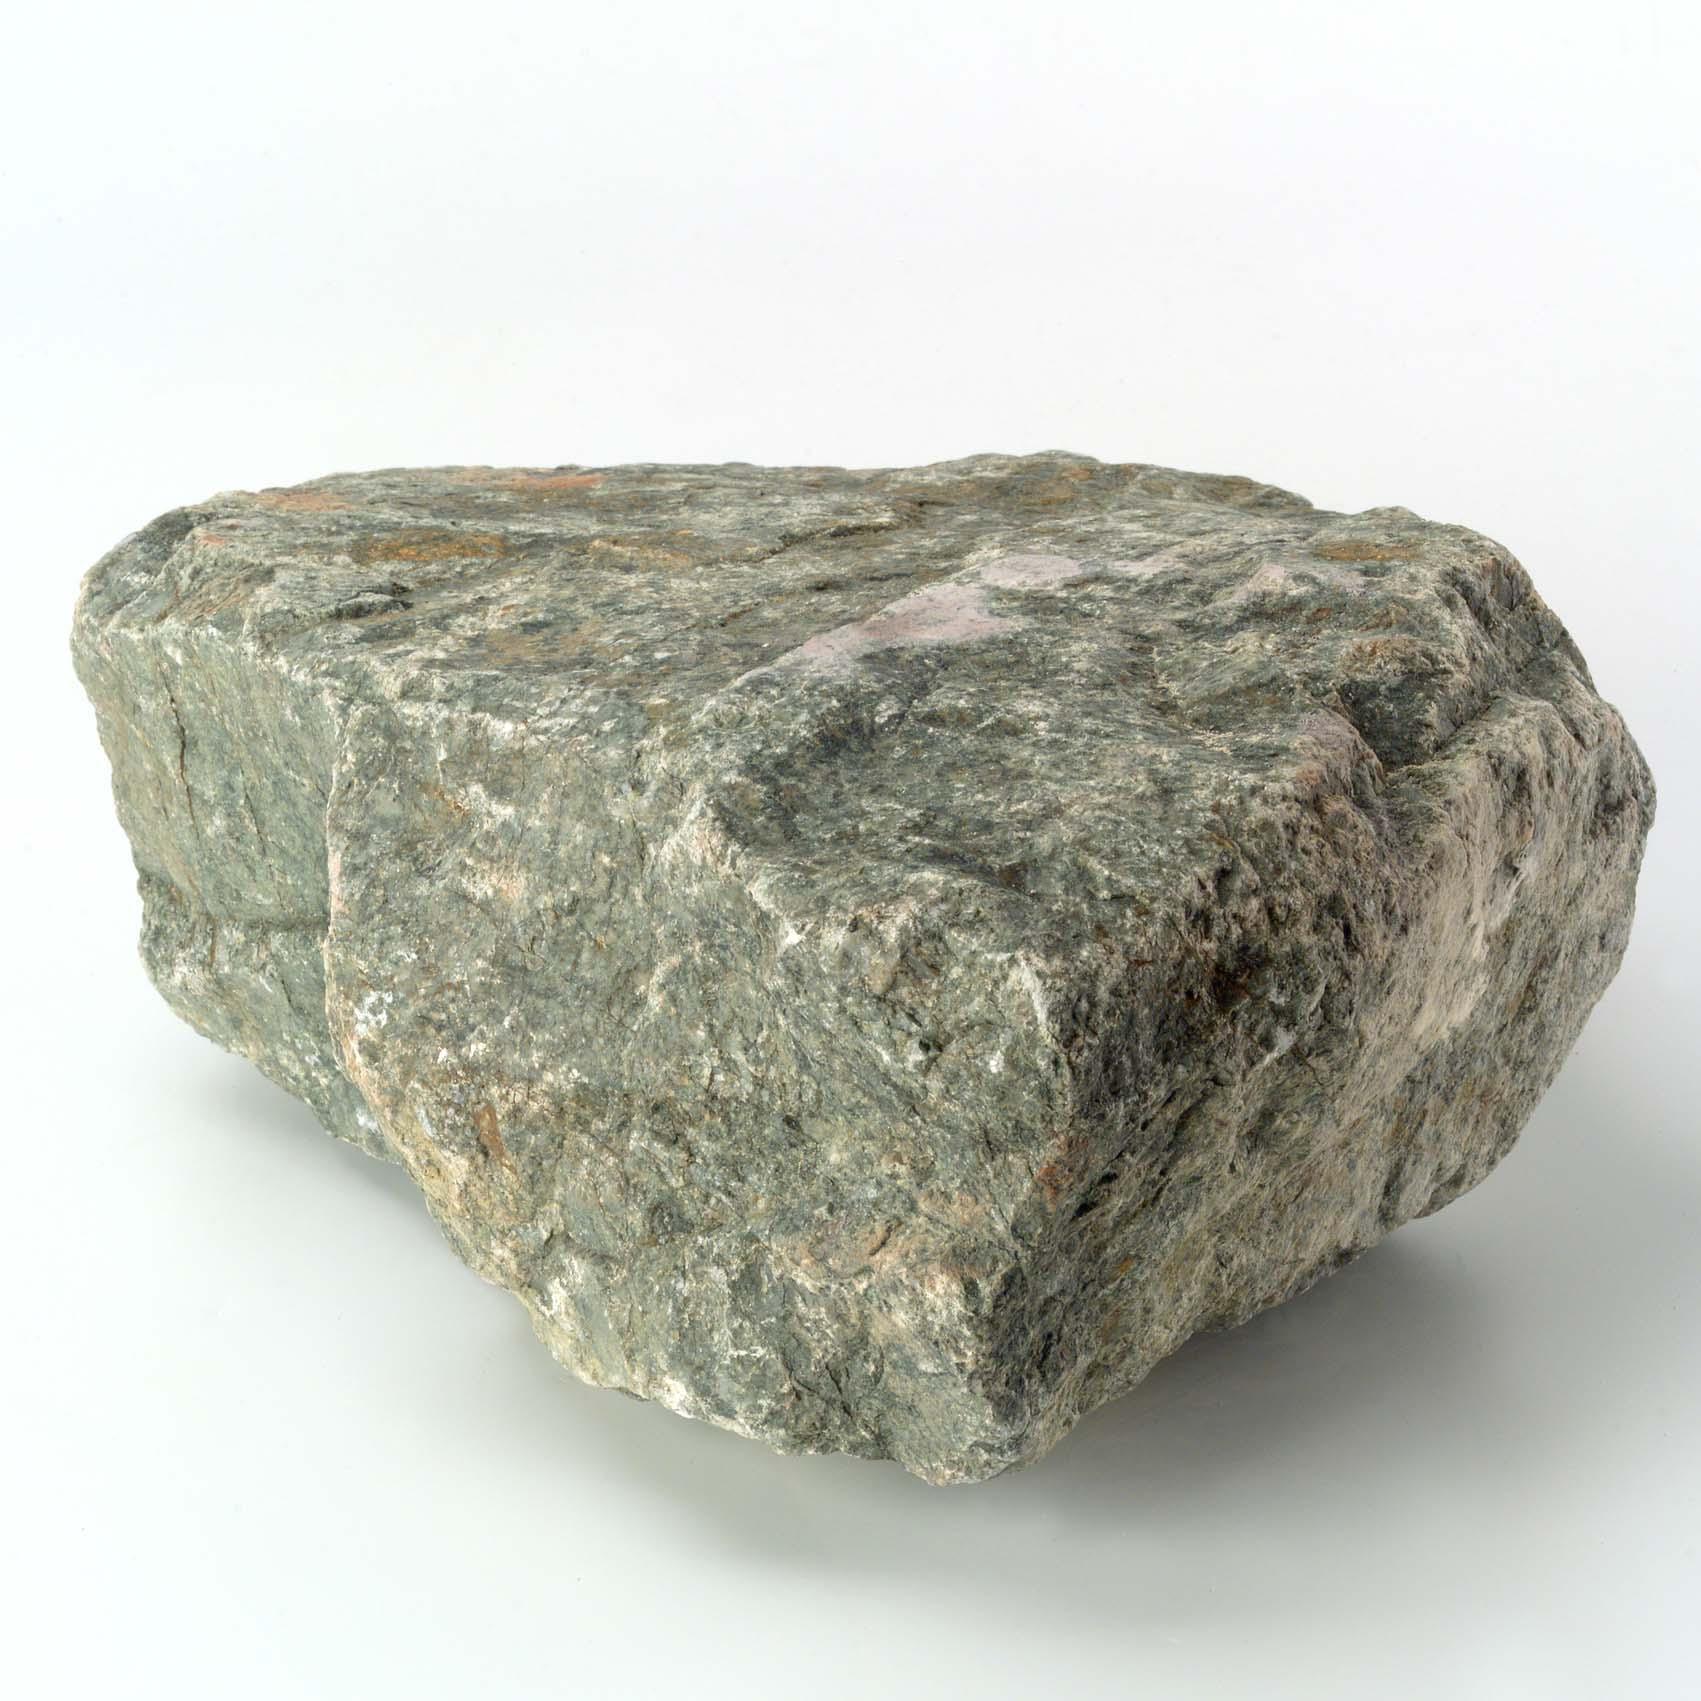 stone+is+better+rock+rock+_aa216078da25e7ef8ad491ab0bf0daa8.jpg